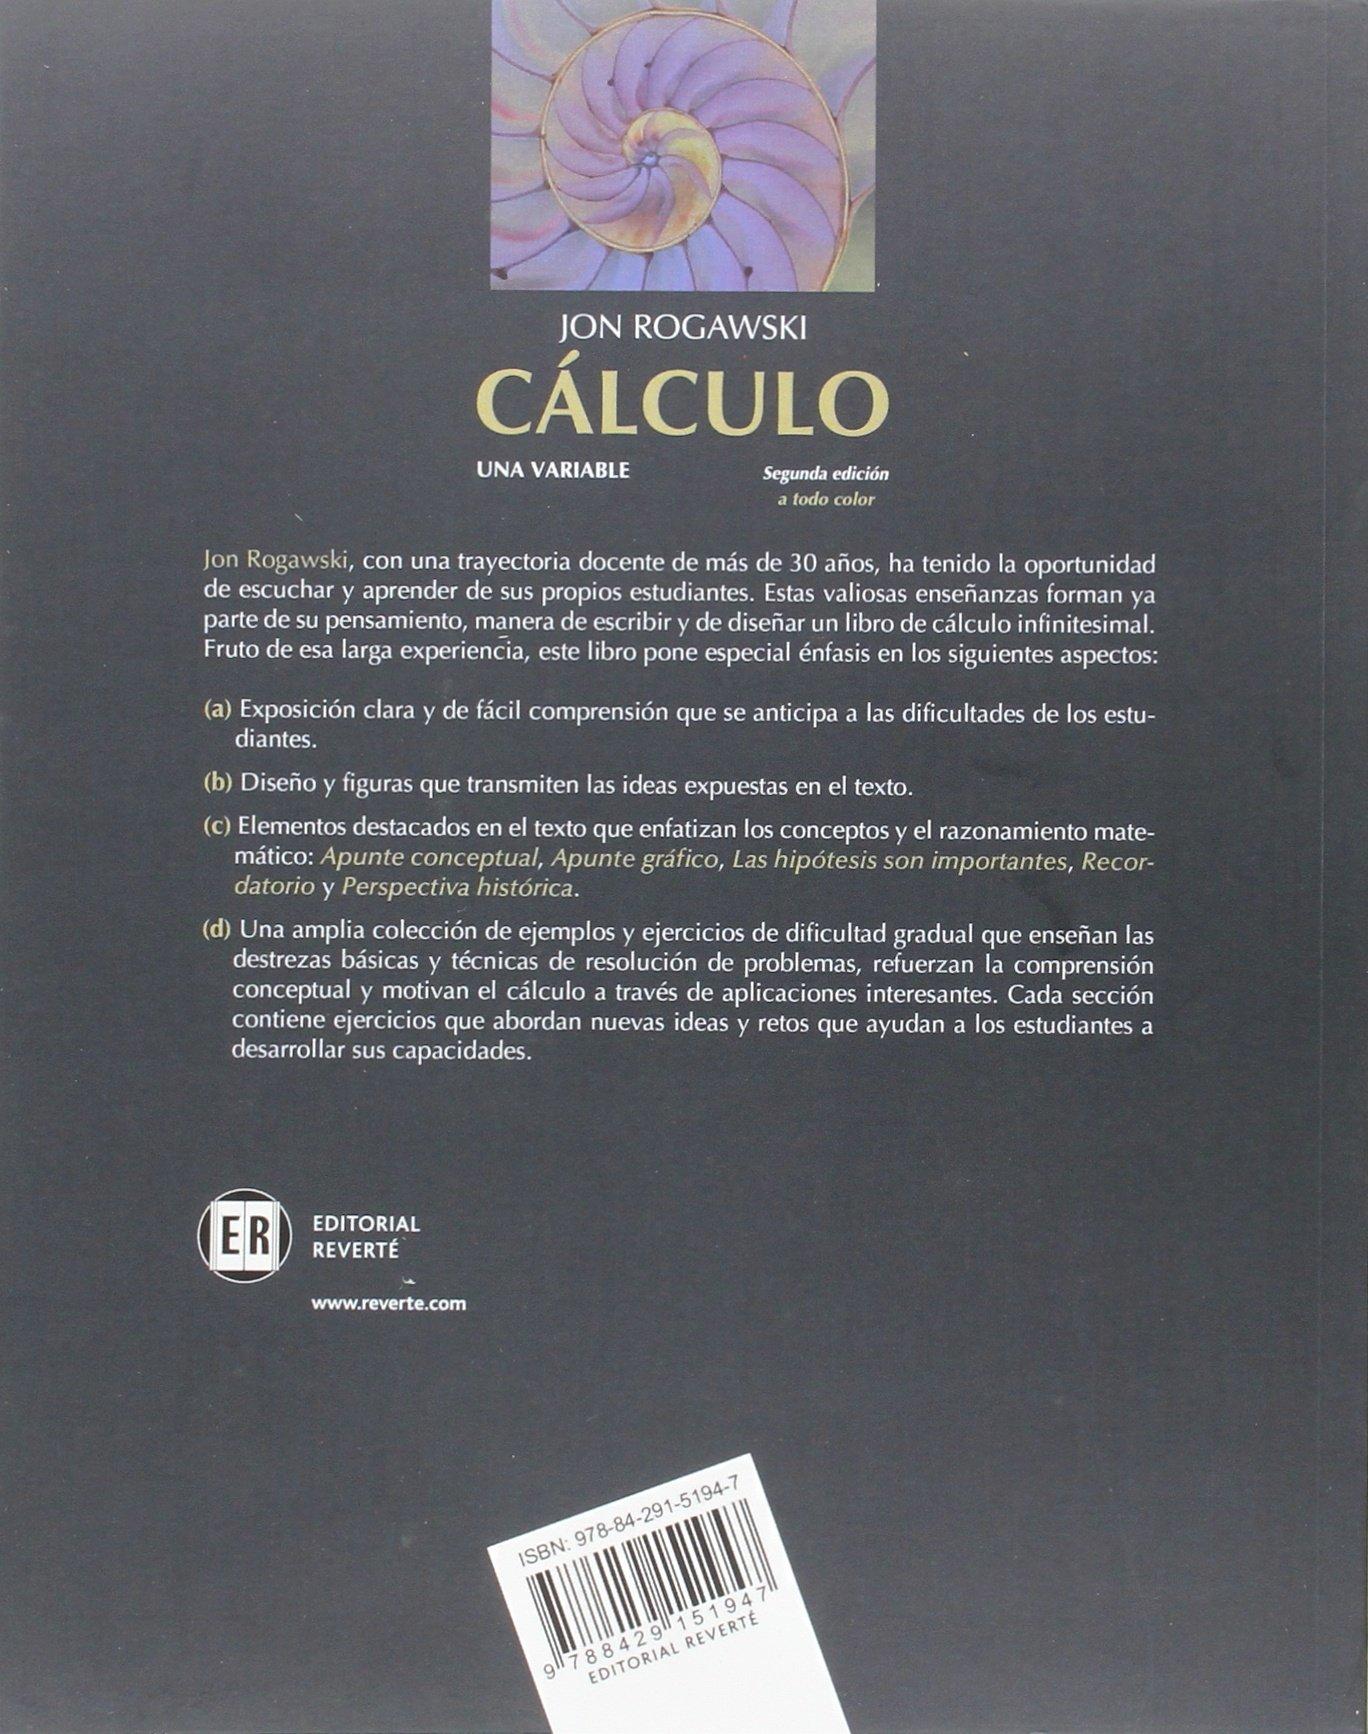 systema spetsnaz manual pdf best of jon rogawski calculo Array - calculo  una variable 2 ed jon rogawski 9788429151947 amazon ...